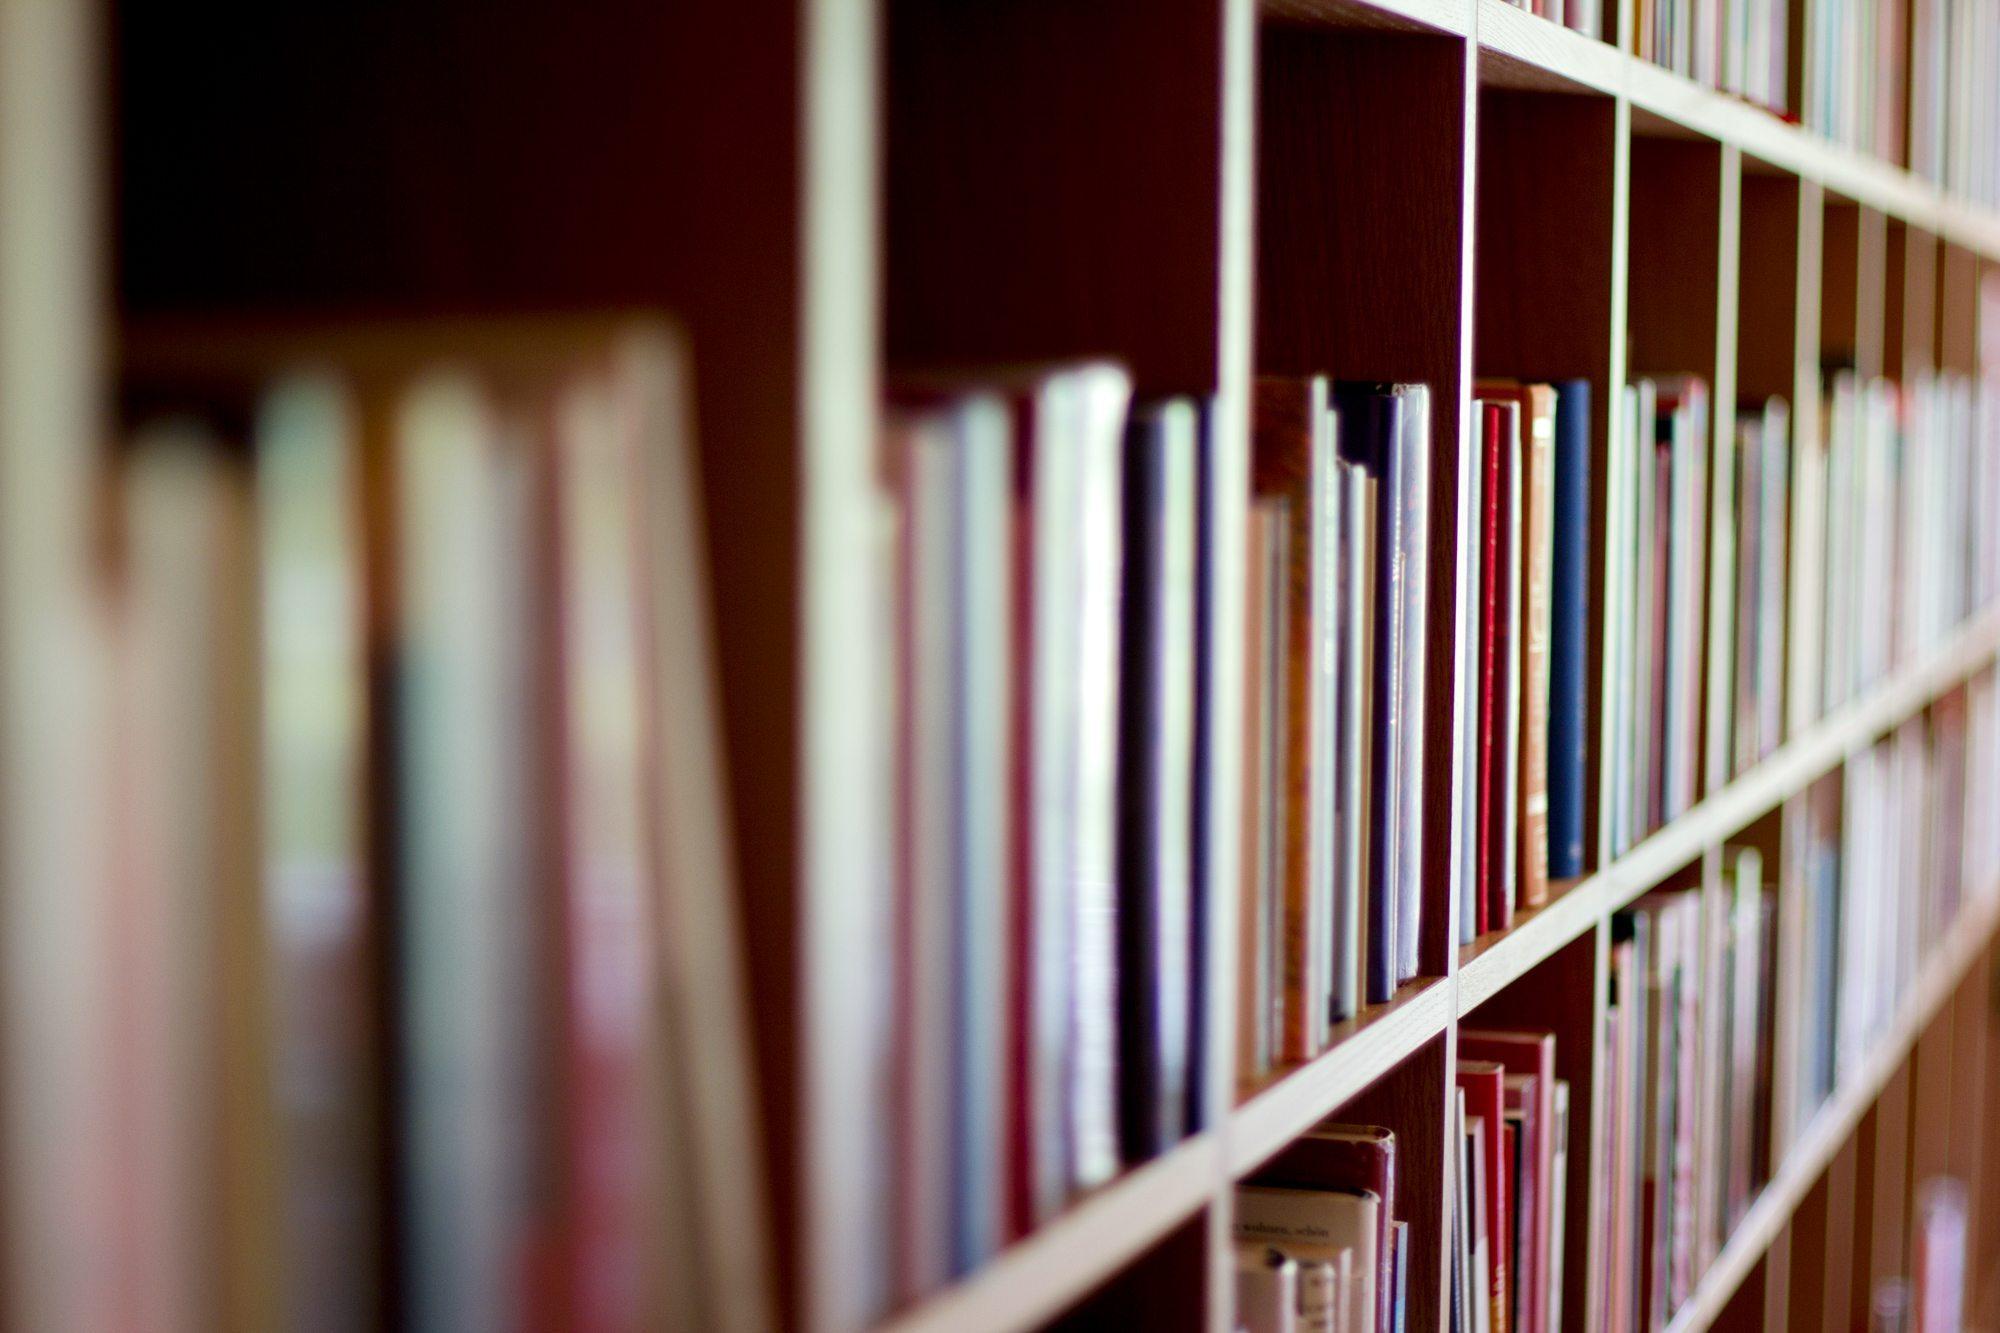 Bibliothek Hotel Krone Au